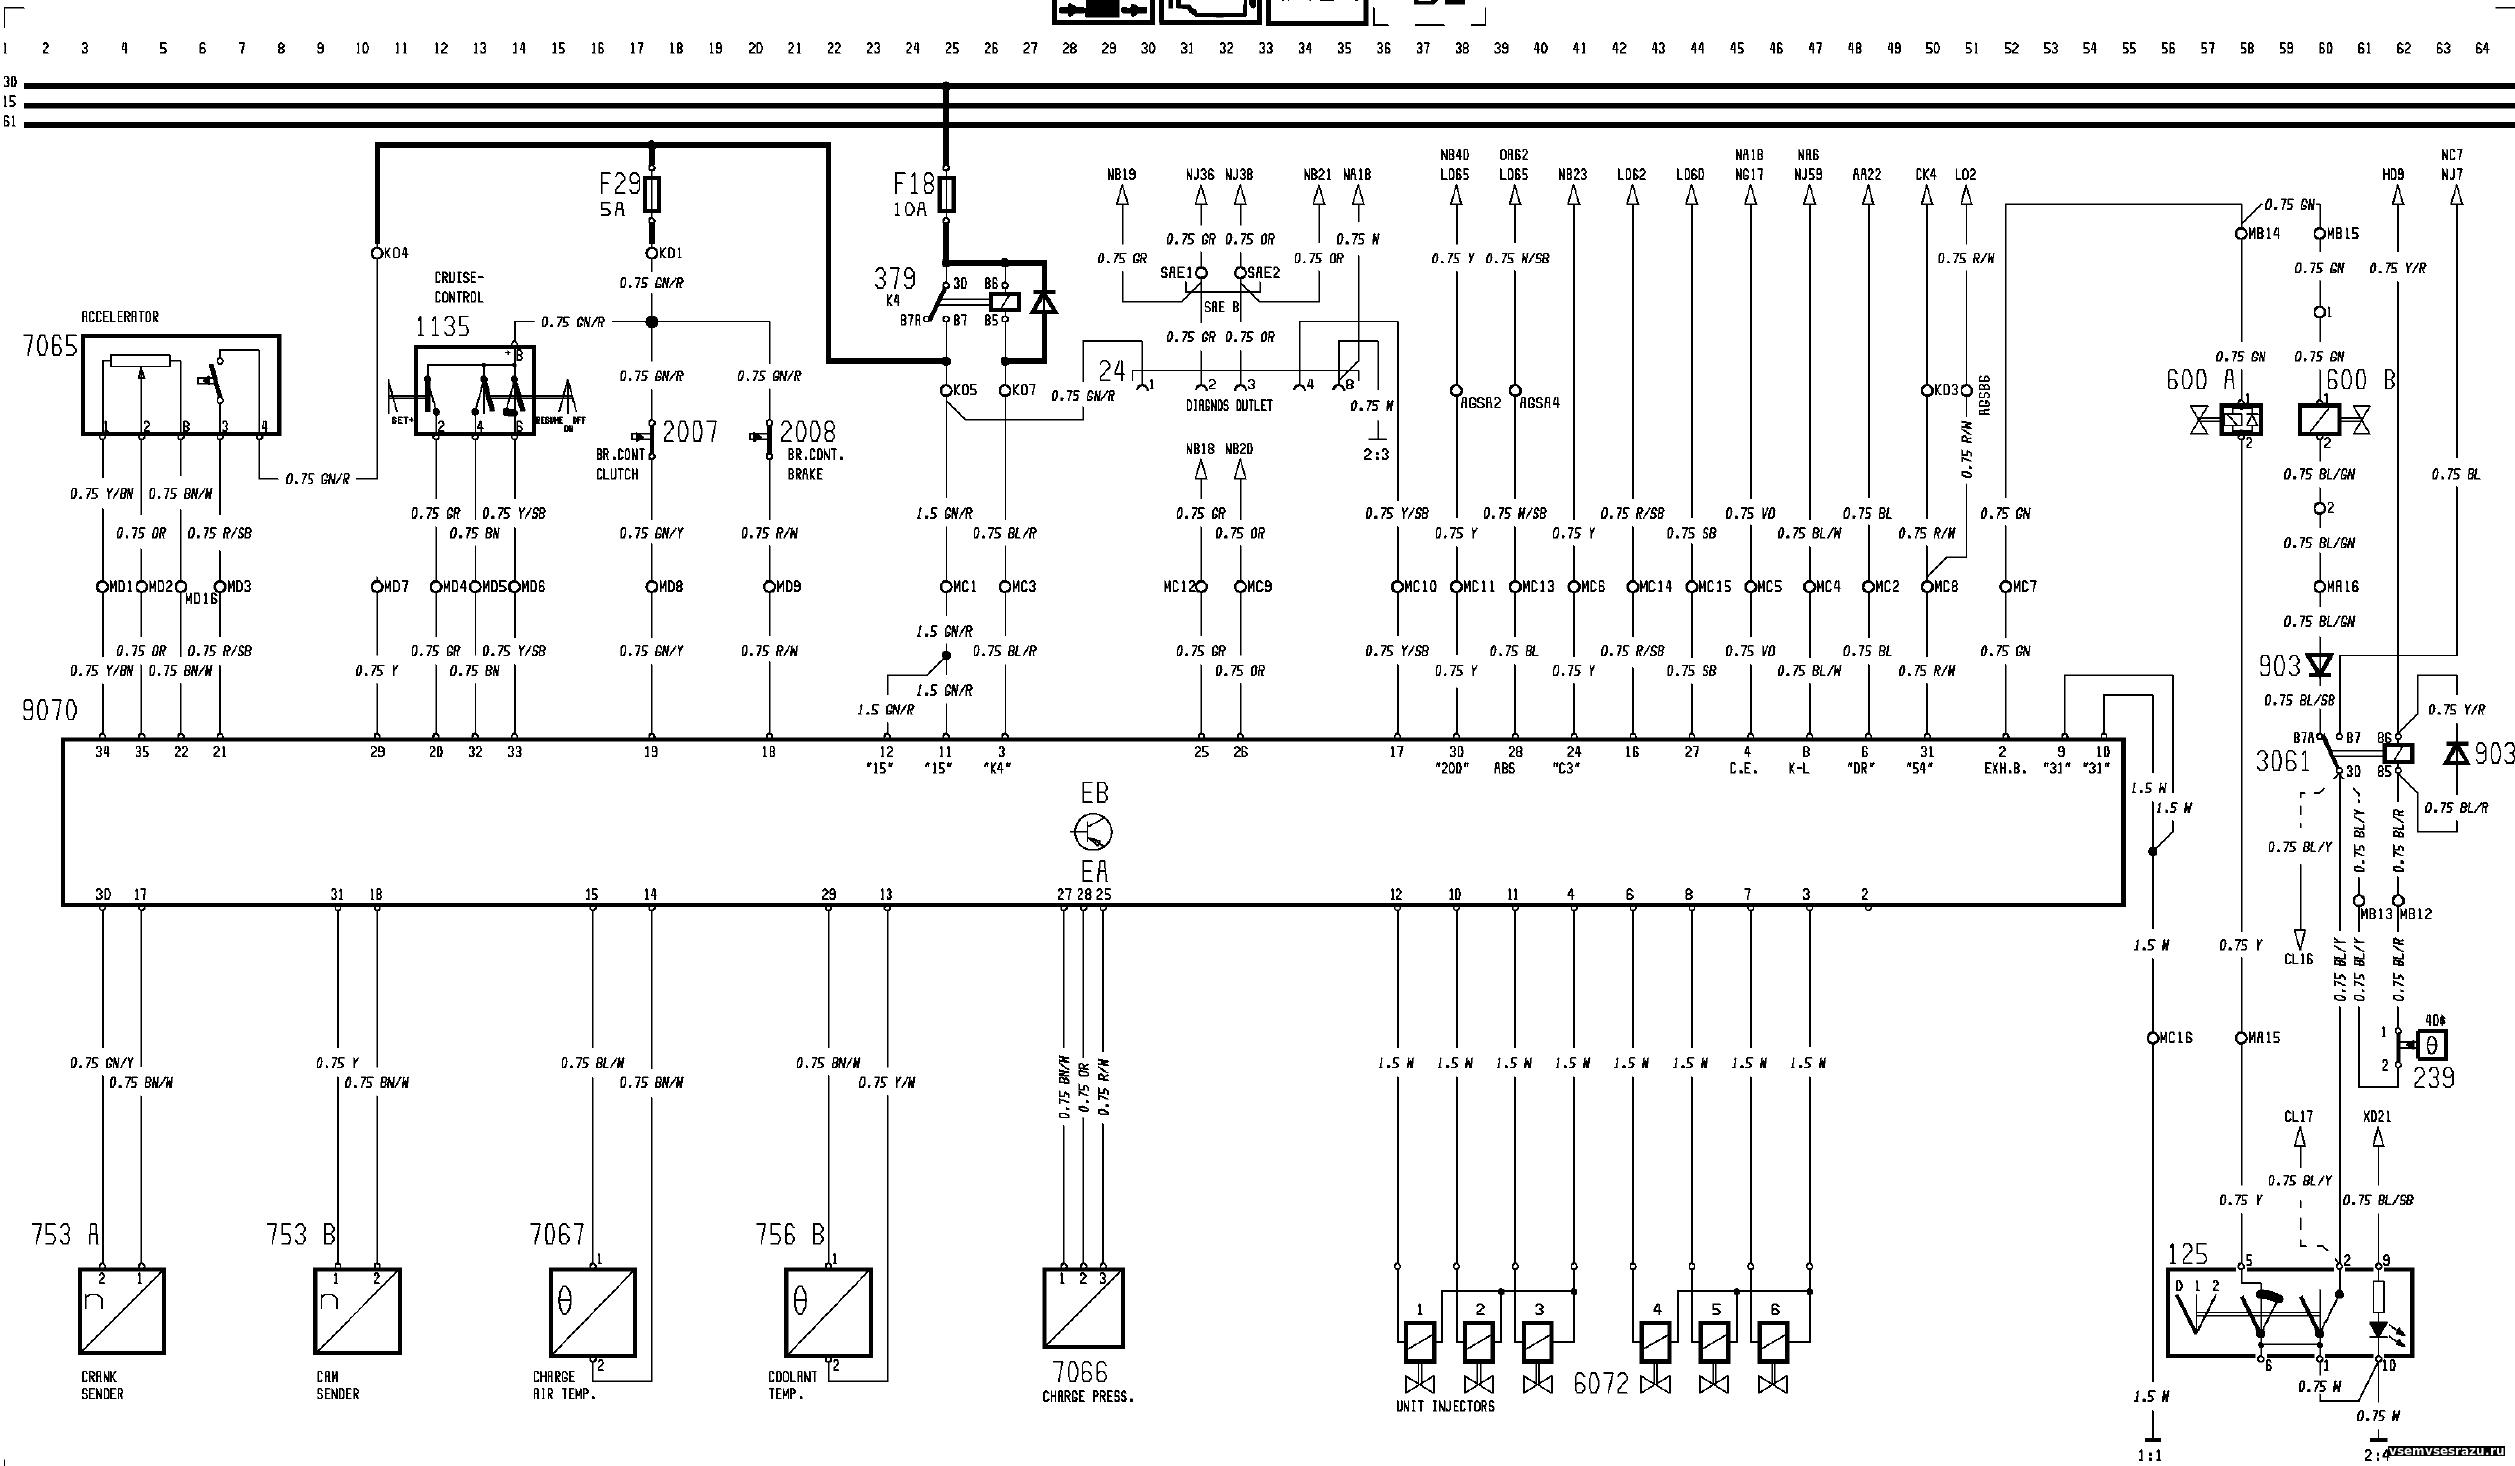 вольво fh12 2003 схема работы вентилятора печки